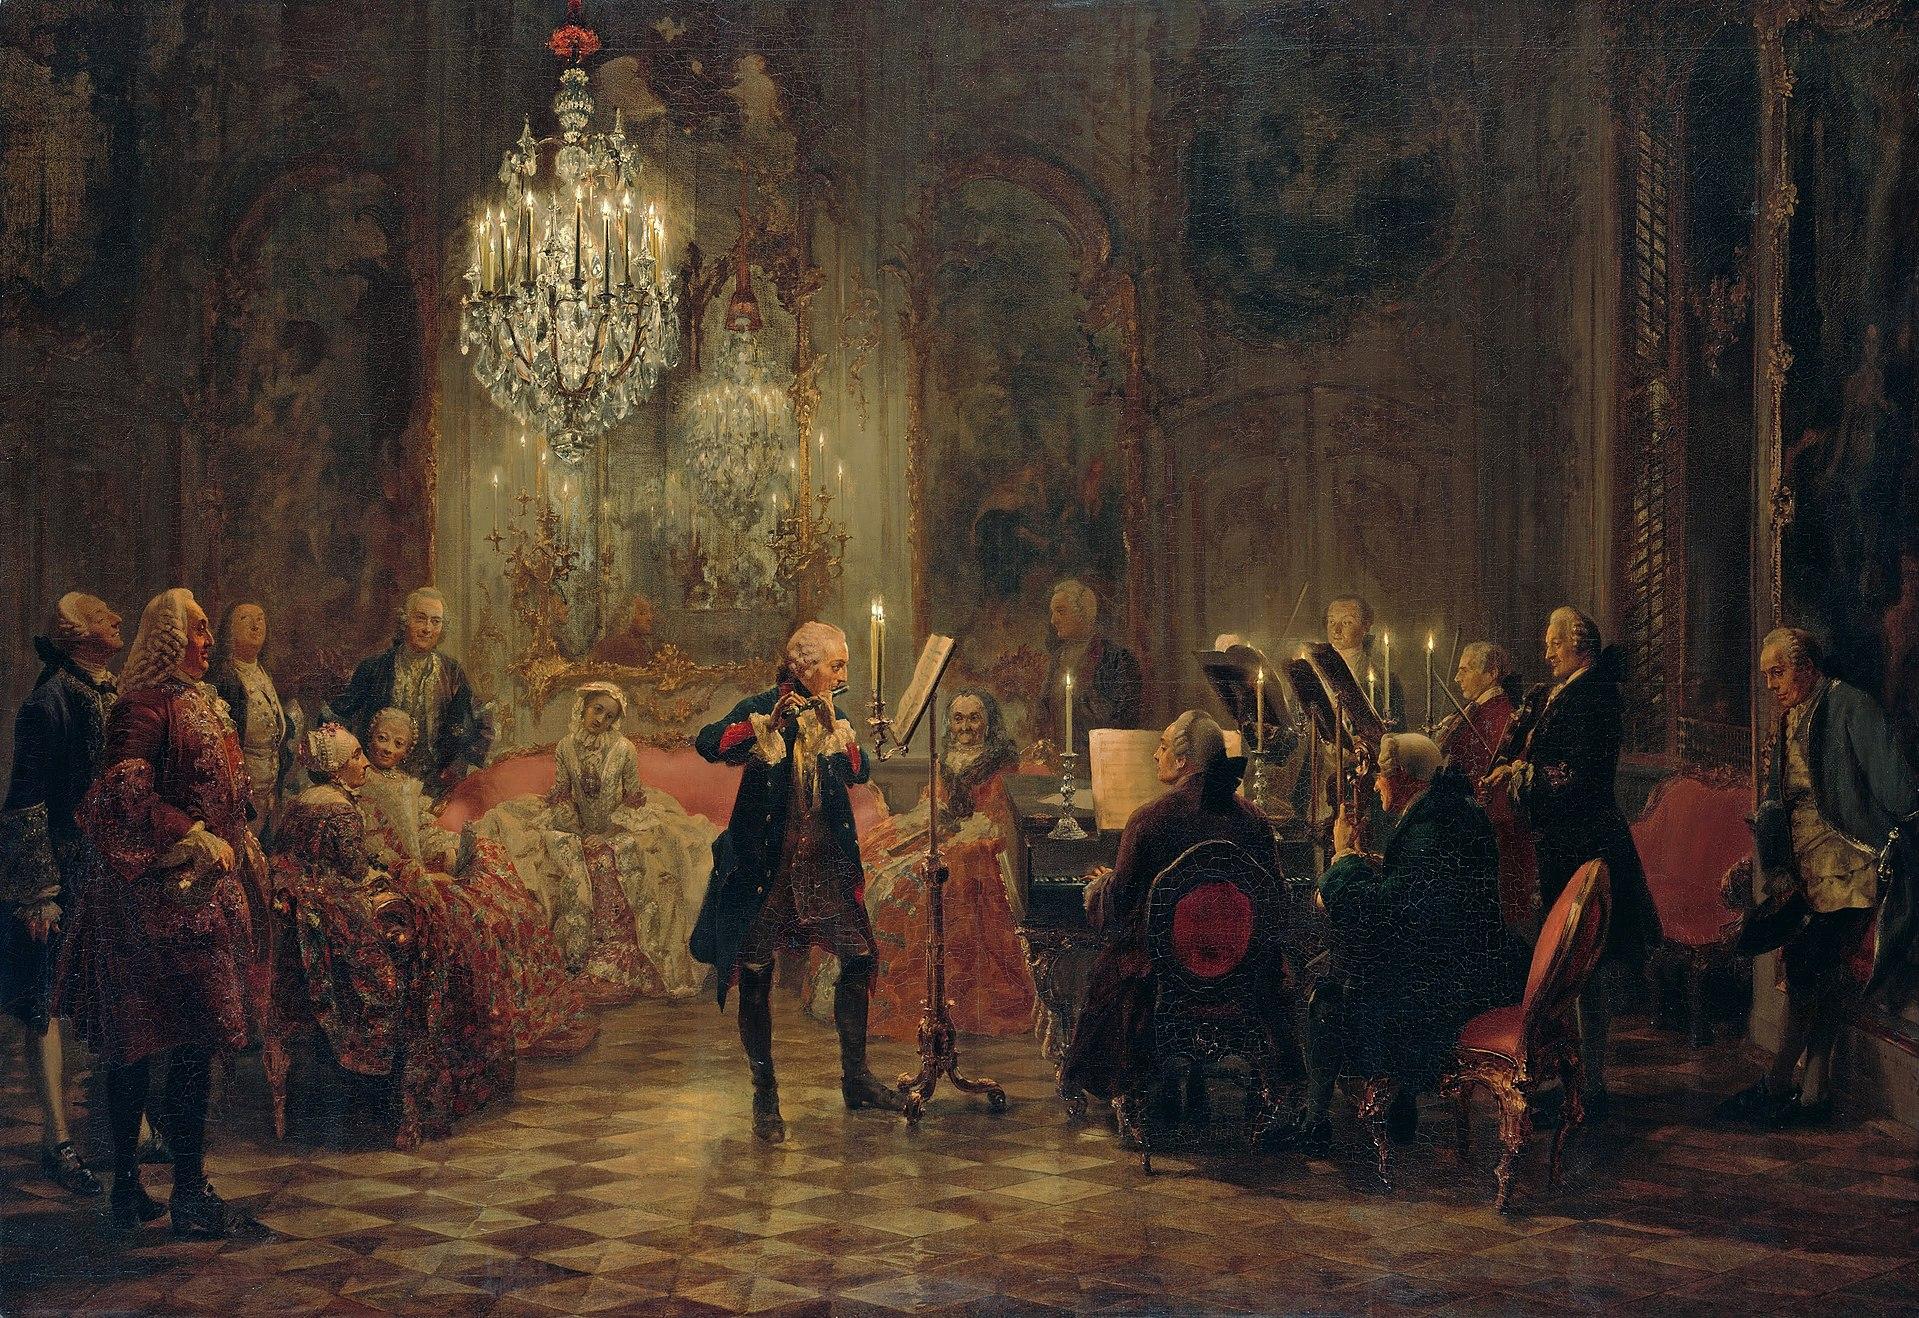 1920px-Adolph_Menzel_-_Flötenkonzert_Friedrichs_des_Großen_in_Sanssouci_-_Google_Art_Project.jpg